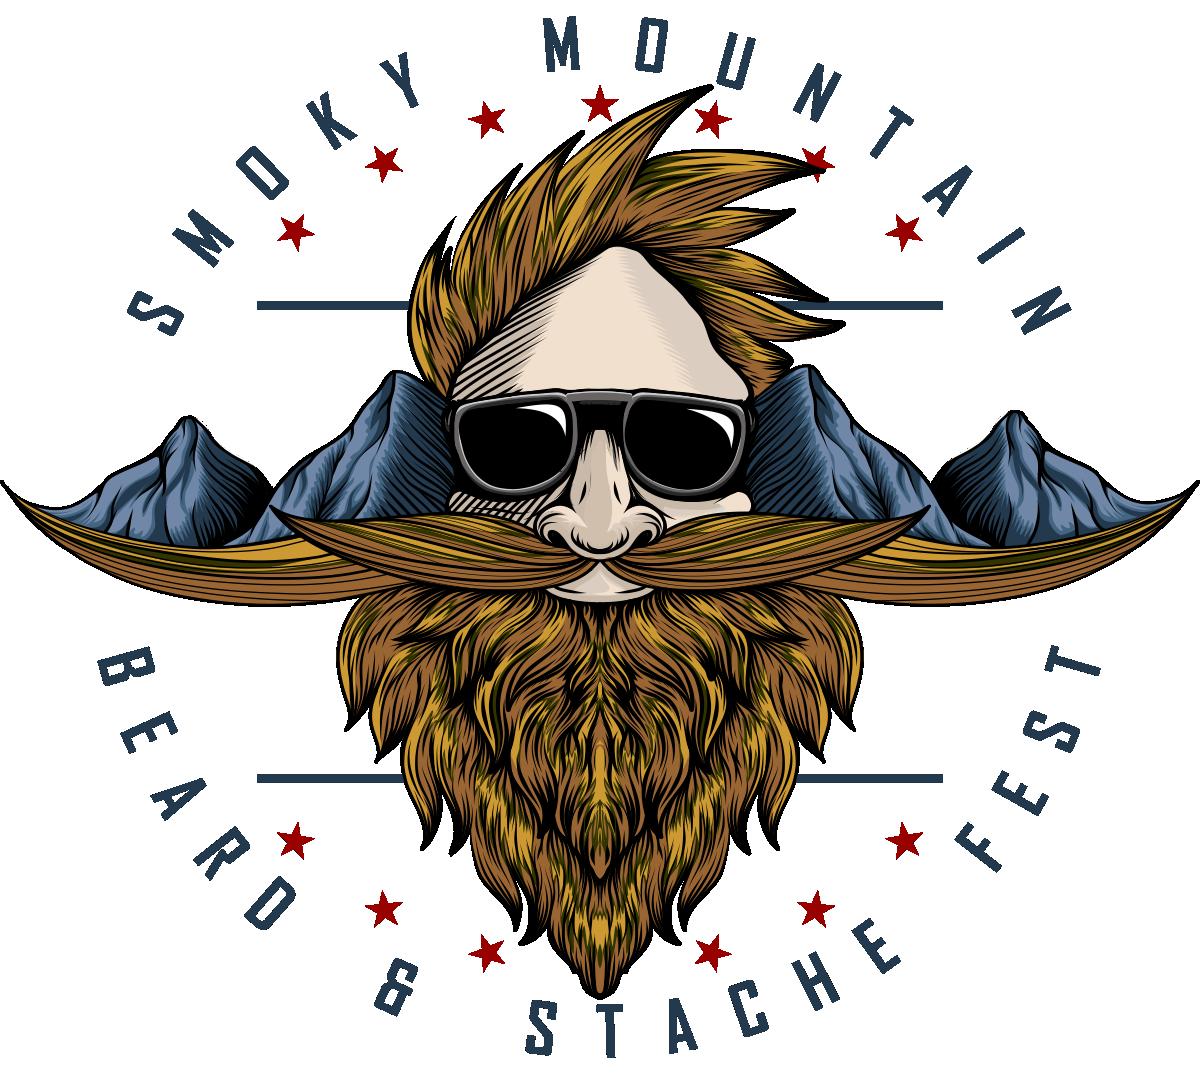 Beard and Stache Logo – C4L